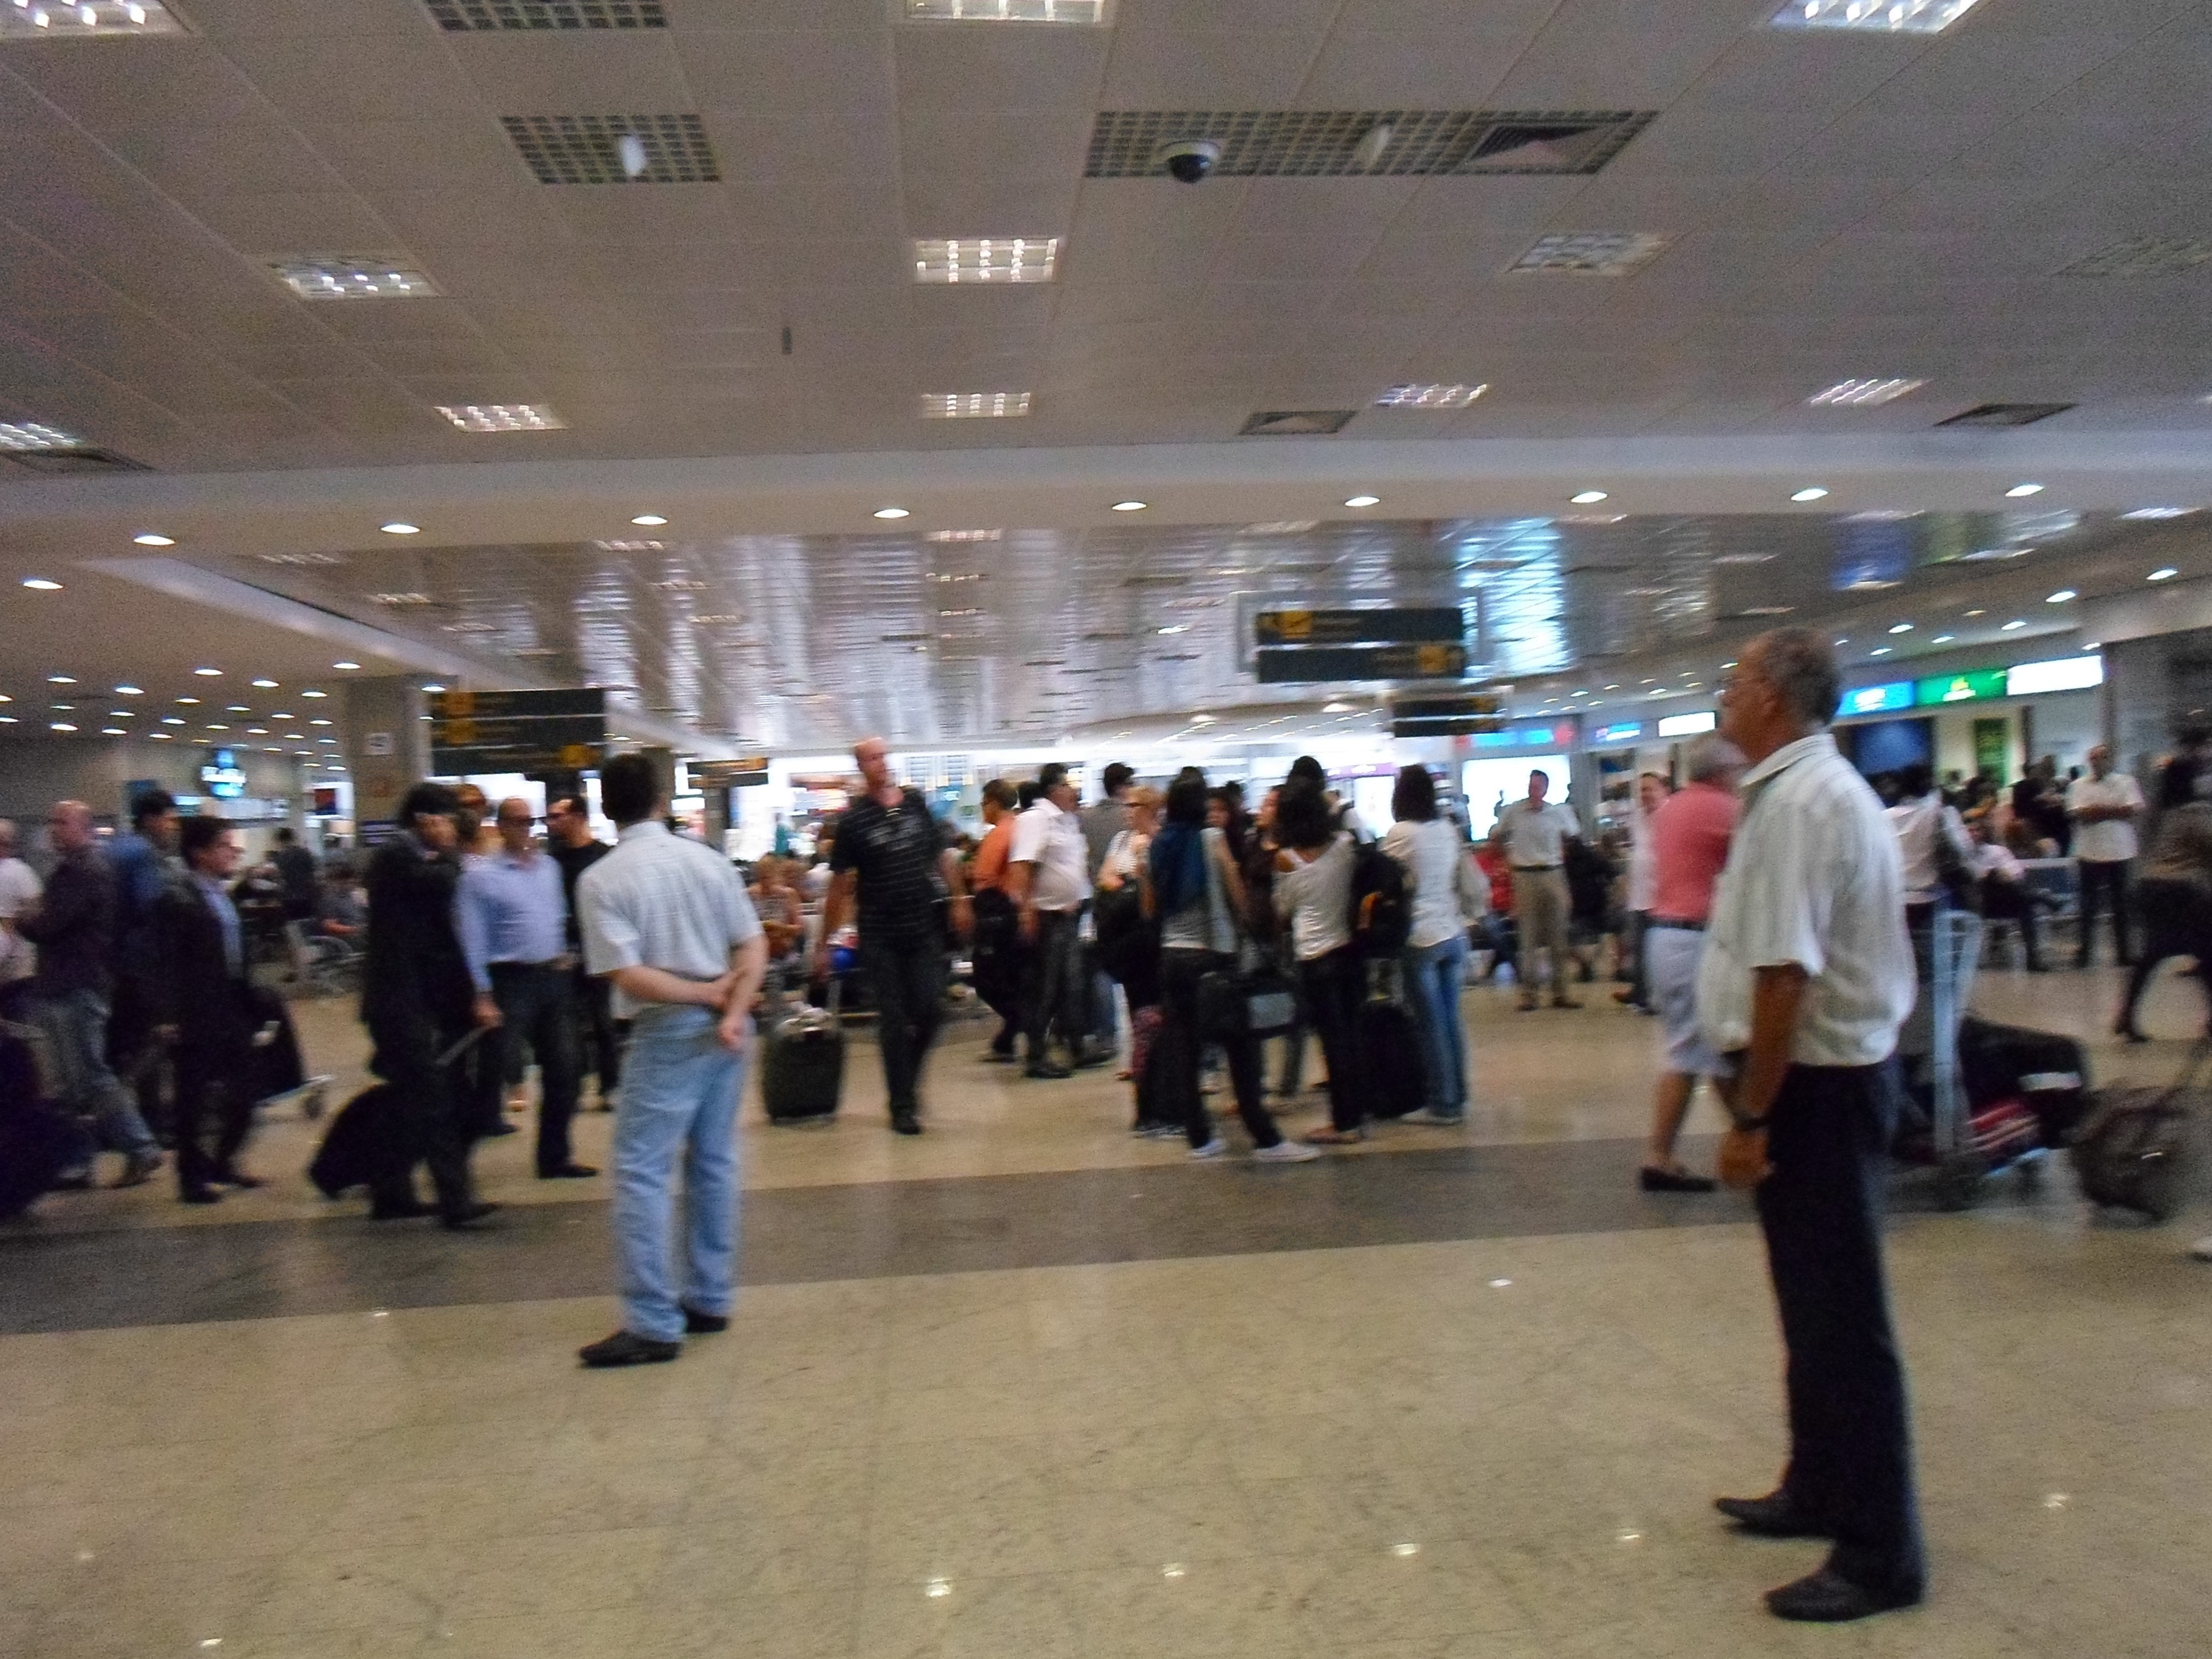 Aeroporto Sp : File:interior do aeroporto internacional de viracopos campinas sp